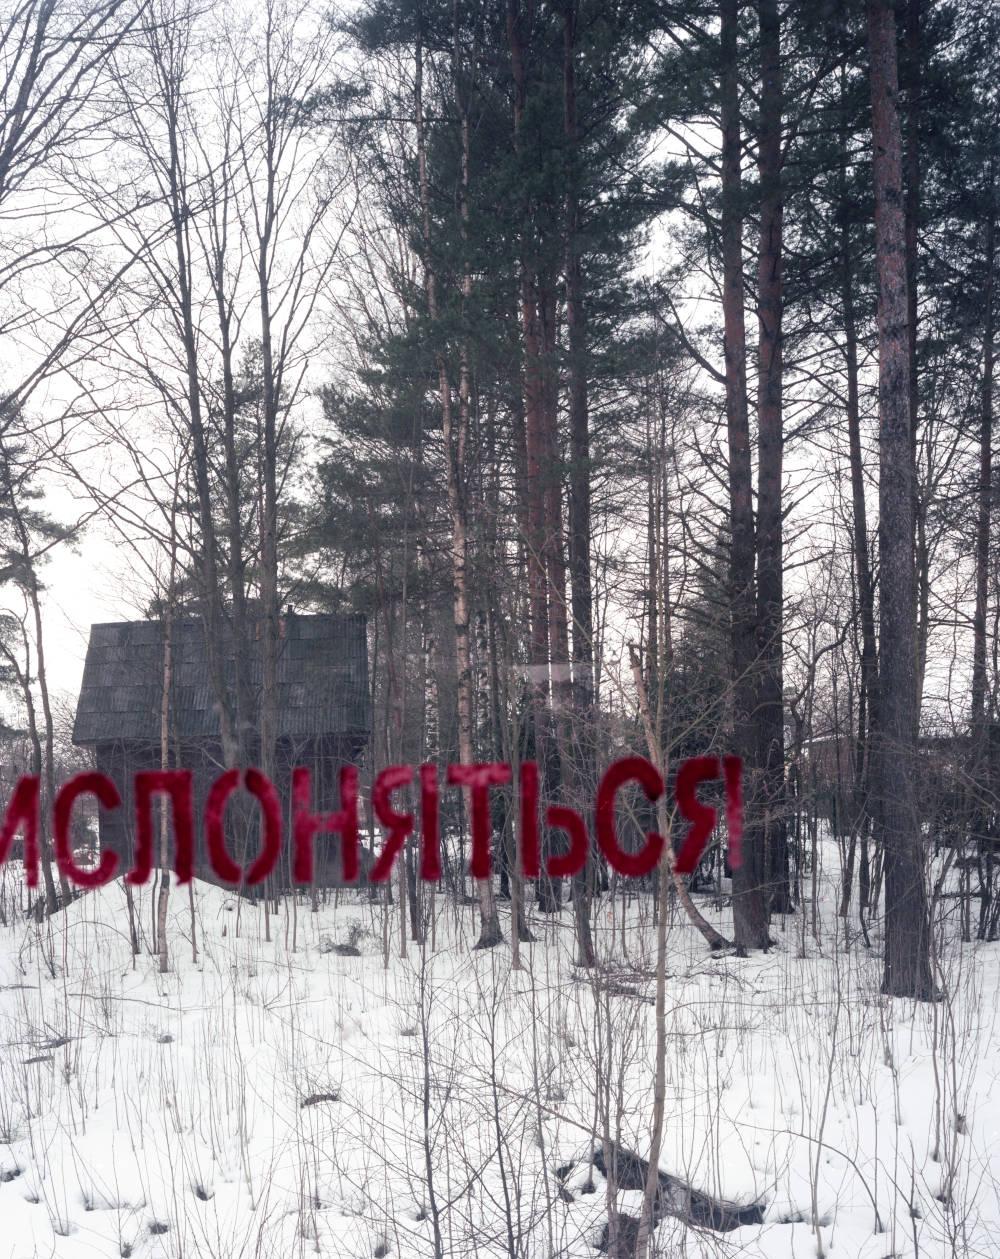 Стансы - Не прислоняться 16/ Stances - Ne prisloniatsia 16